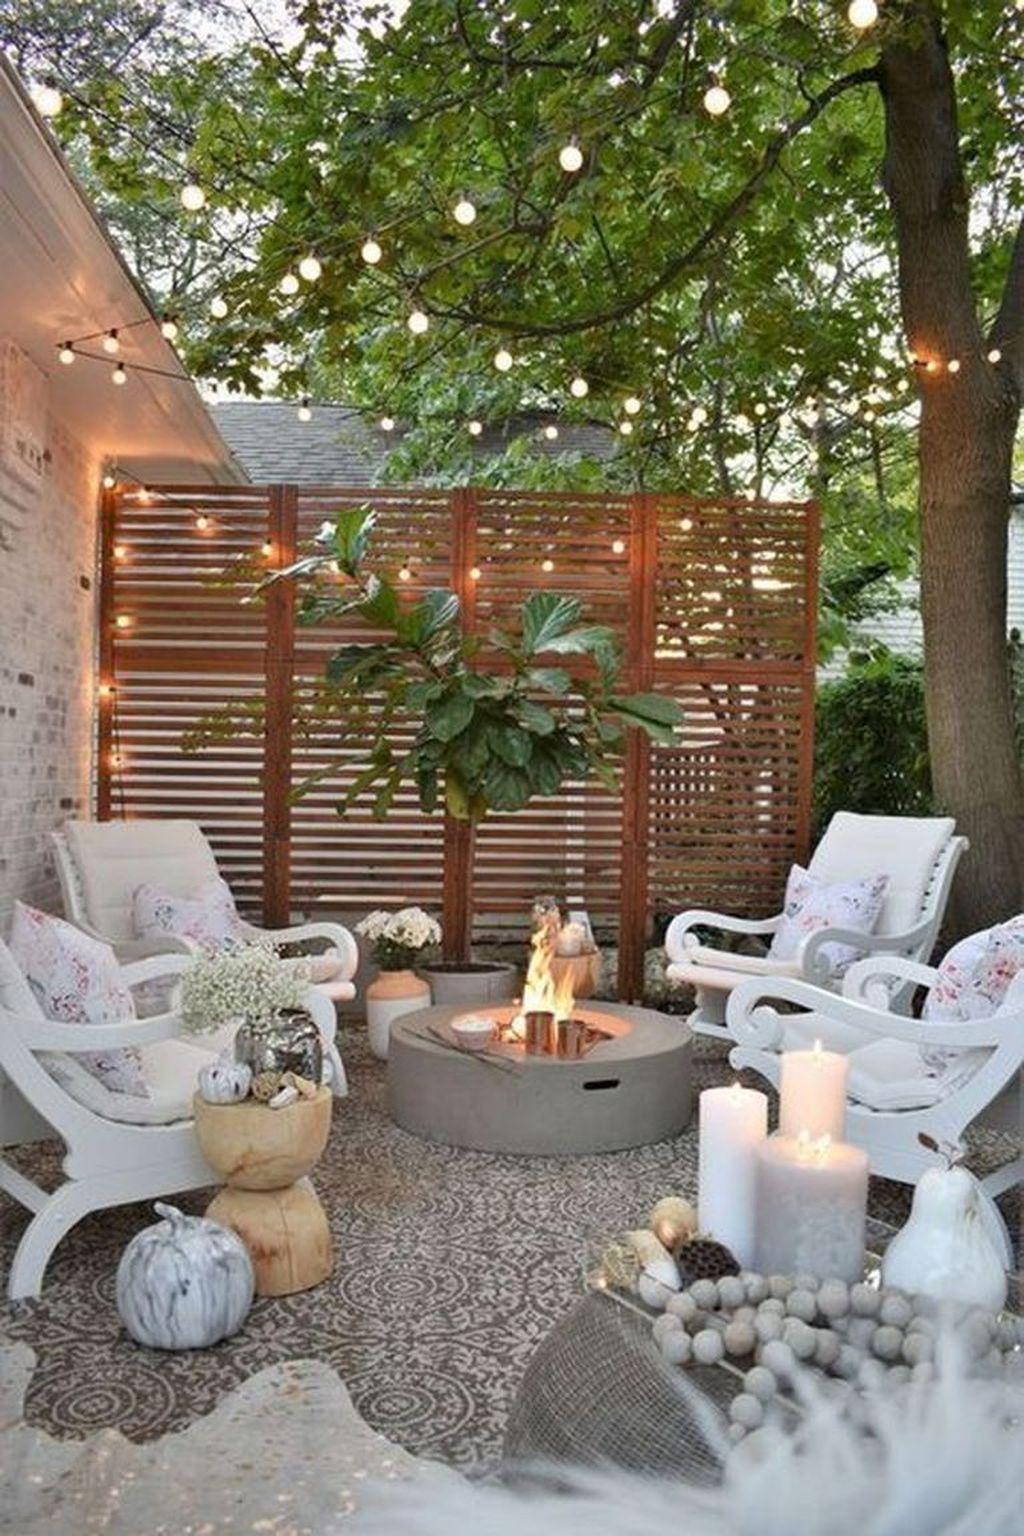 The Best Romantic Backyard Decorating Ideas 07